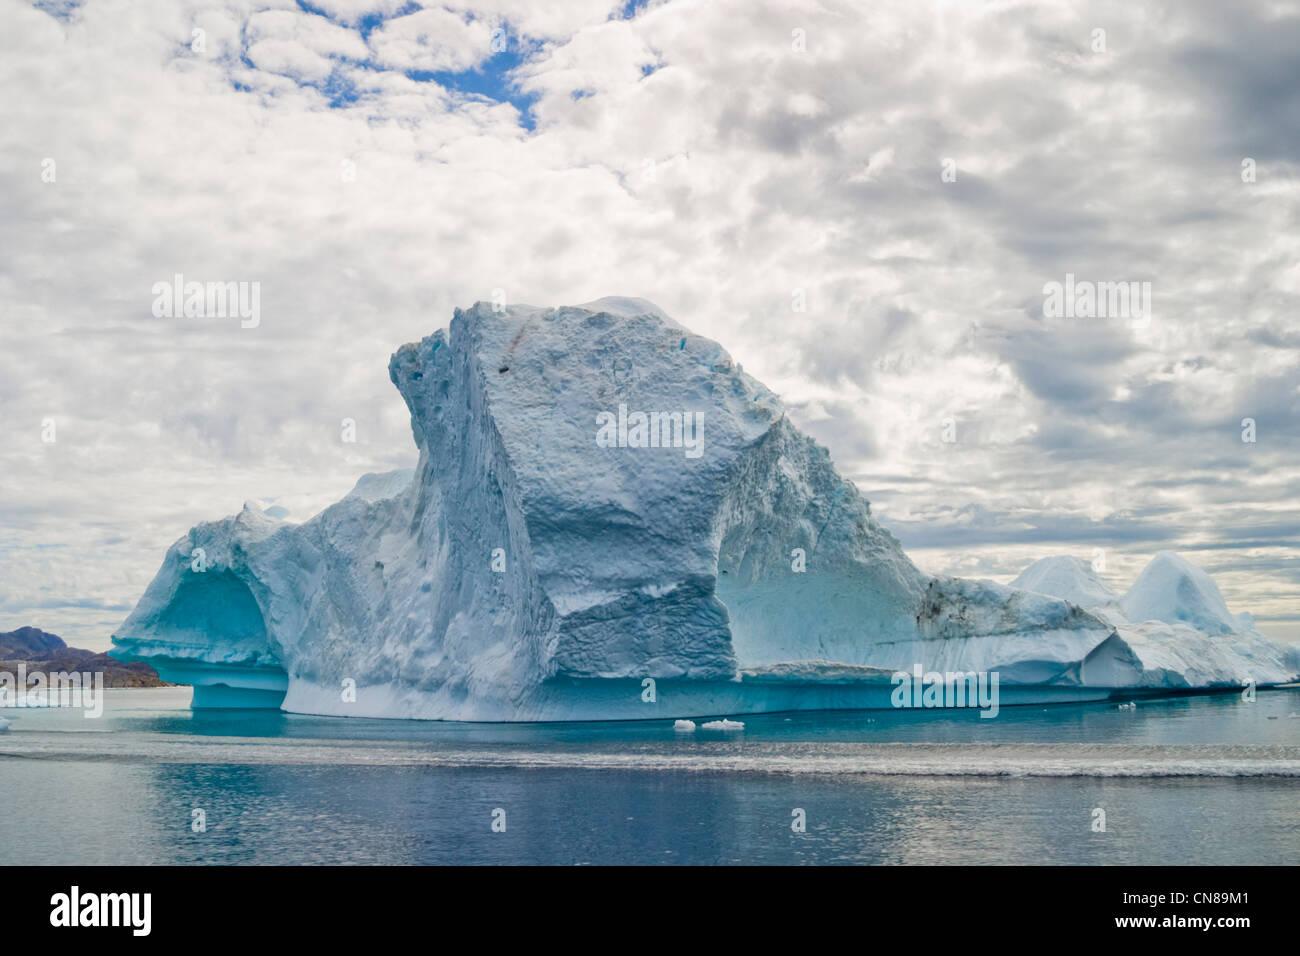 Iceberg, Greenland arctic coast - Stock Image